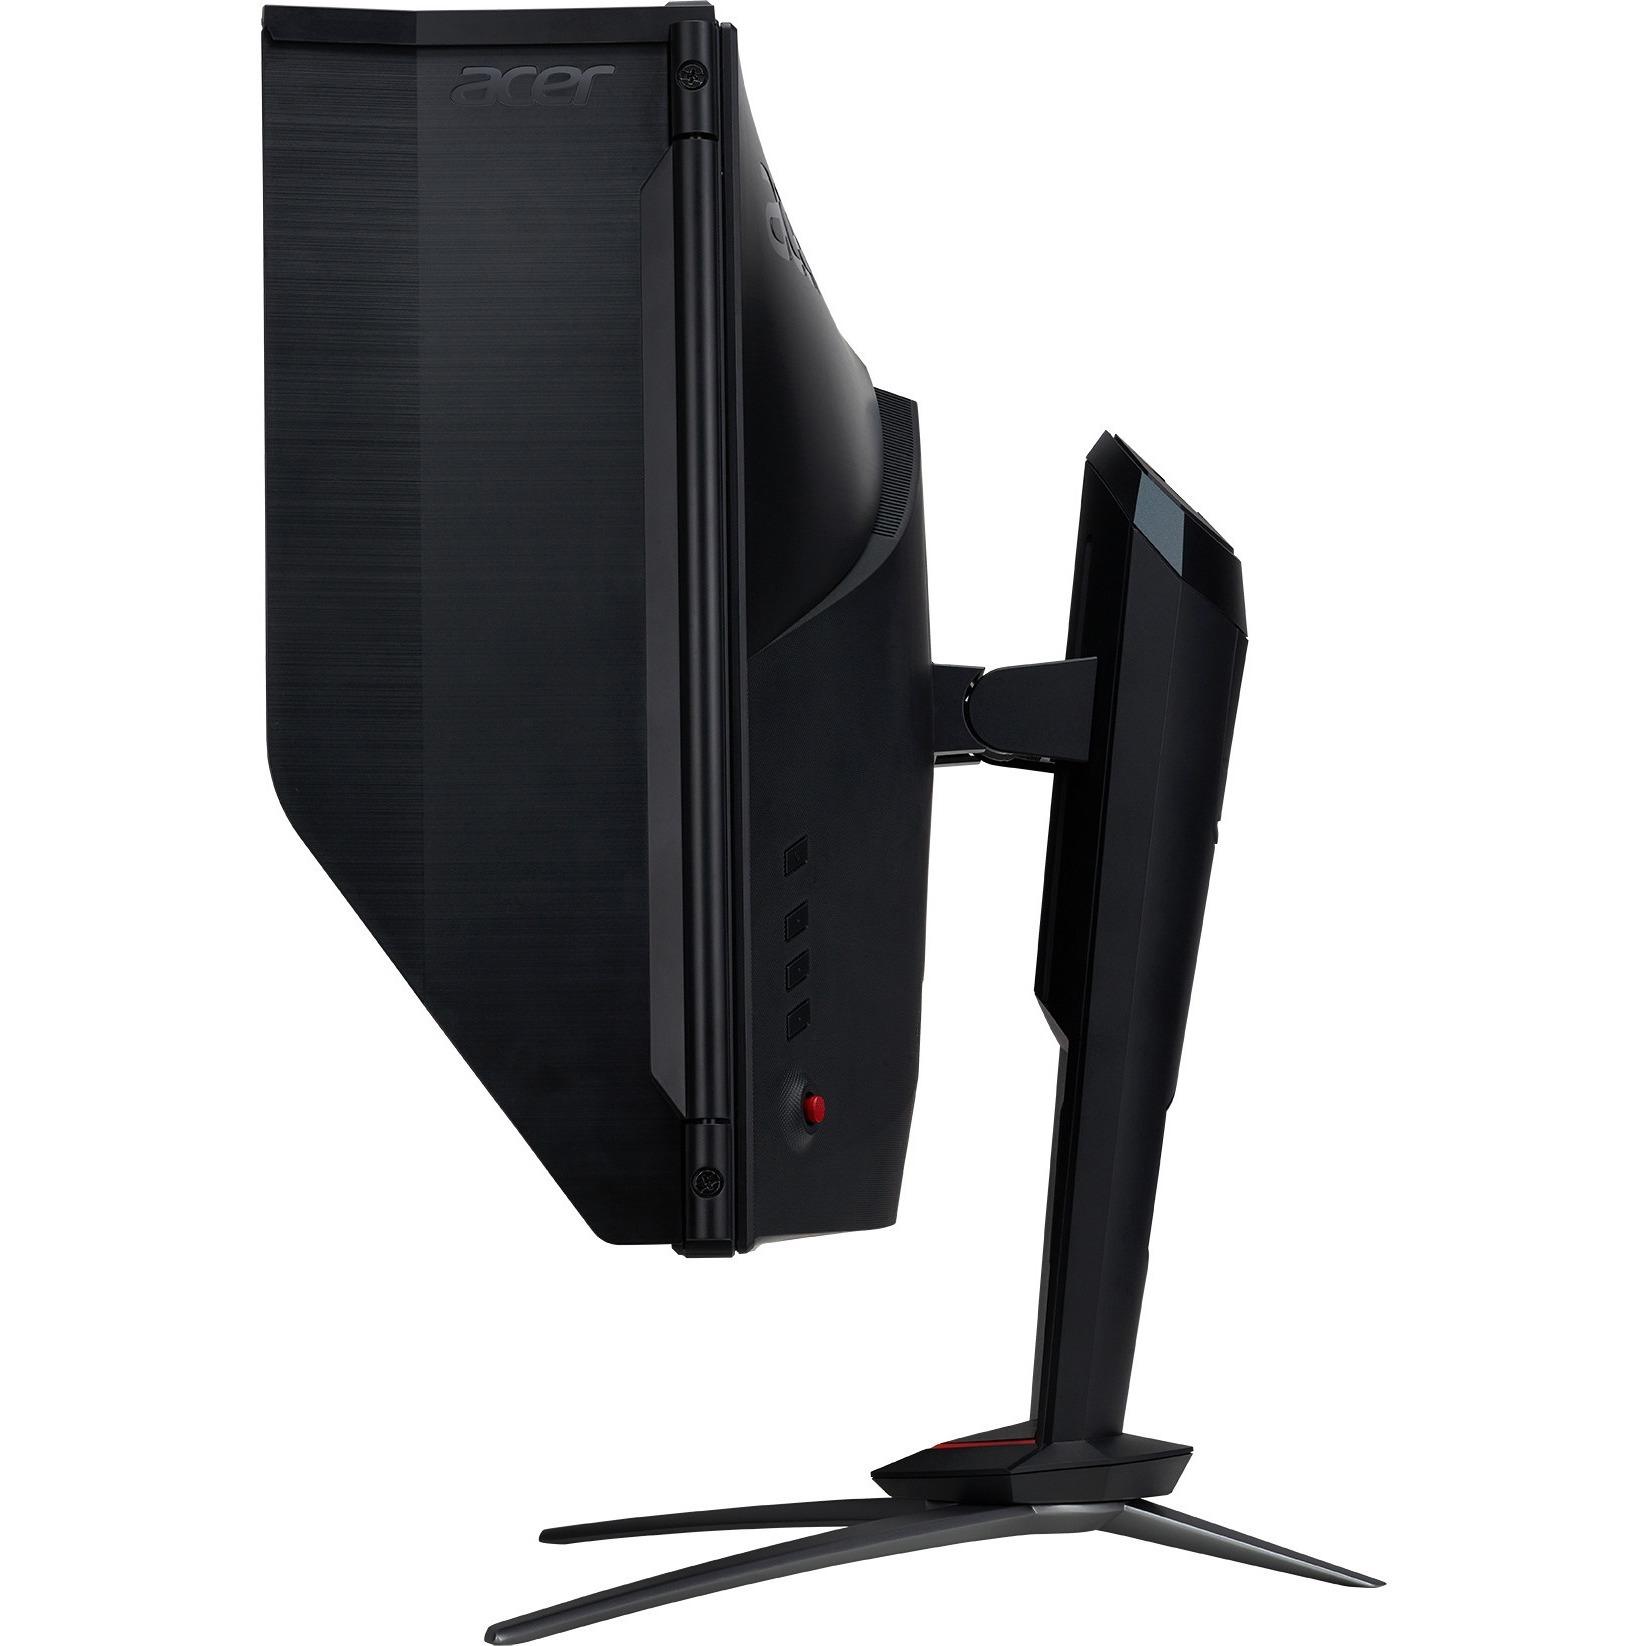 Acer Predator XB273K 68.6 cm 27inch LED LCD Monitor - 16:9 - 4 ms GTG - 3840 x 2160 - 1.07 Billion Colors - 350 cd/mAnd#178;, 400 cd/mAnd#178; - 4K UHD - Speakers - HDMI